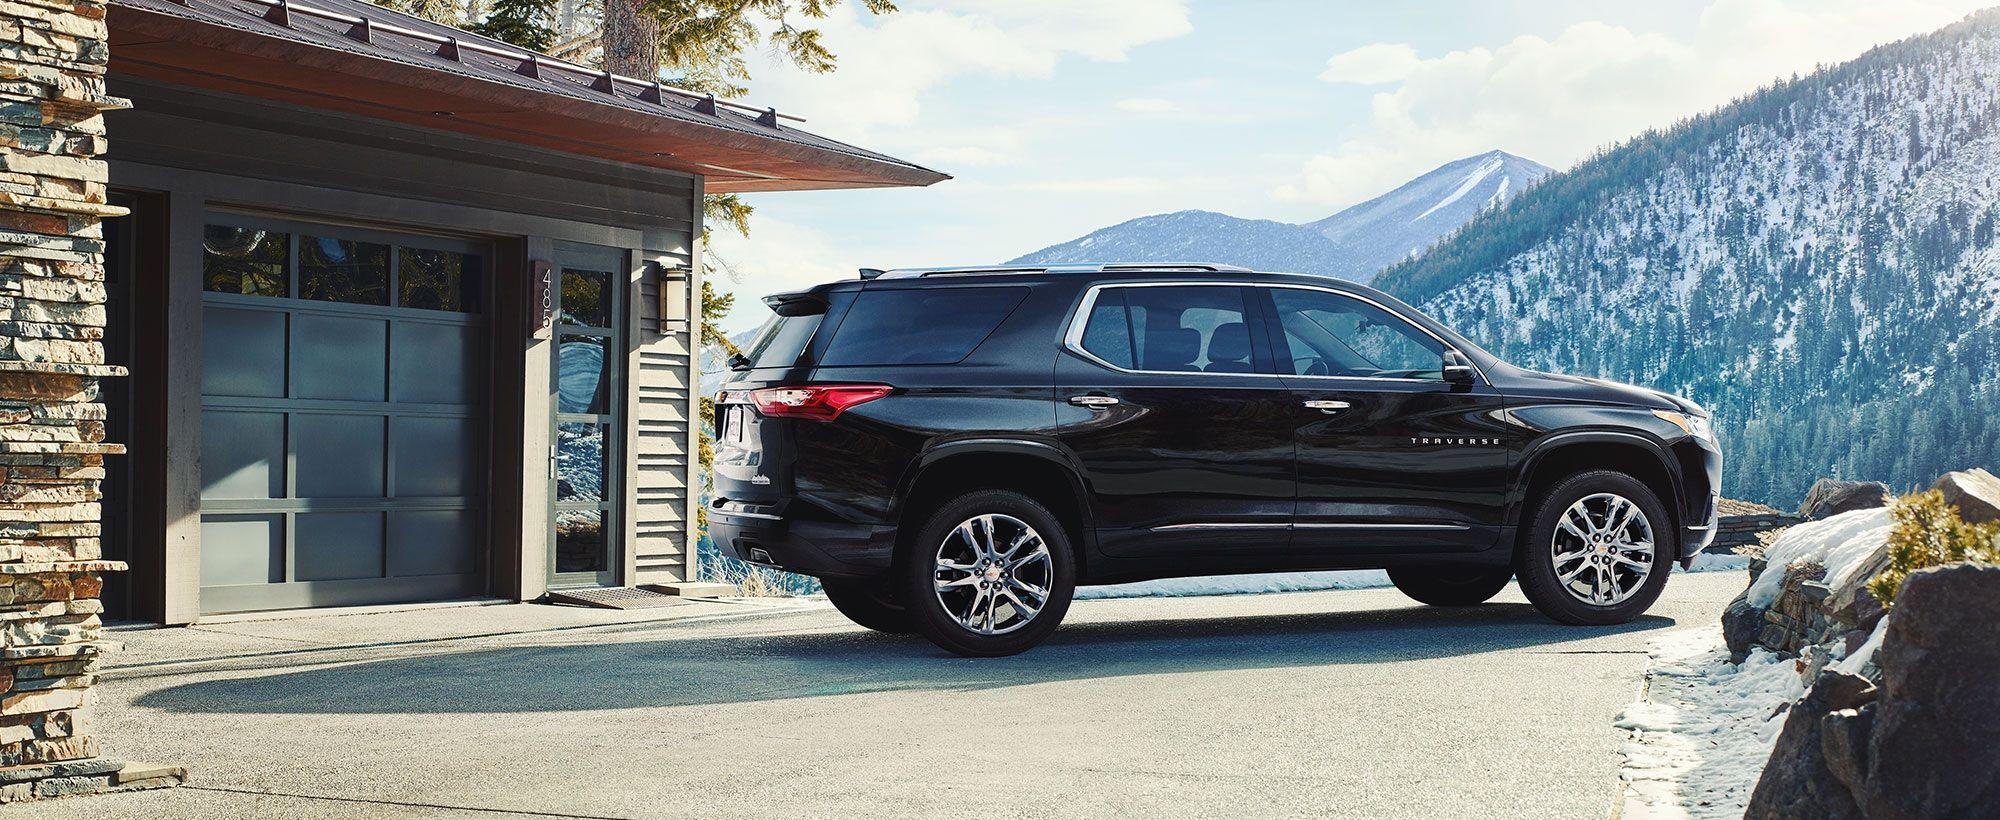 La Chevrolet Traverse 2019 se adapta a tu estilo de vida.